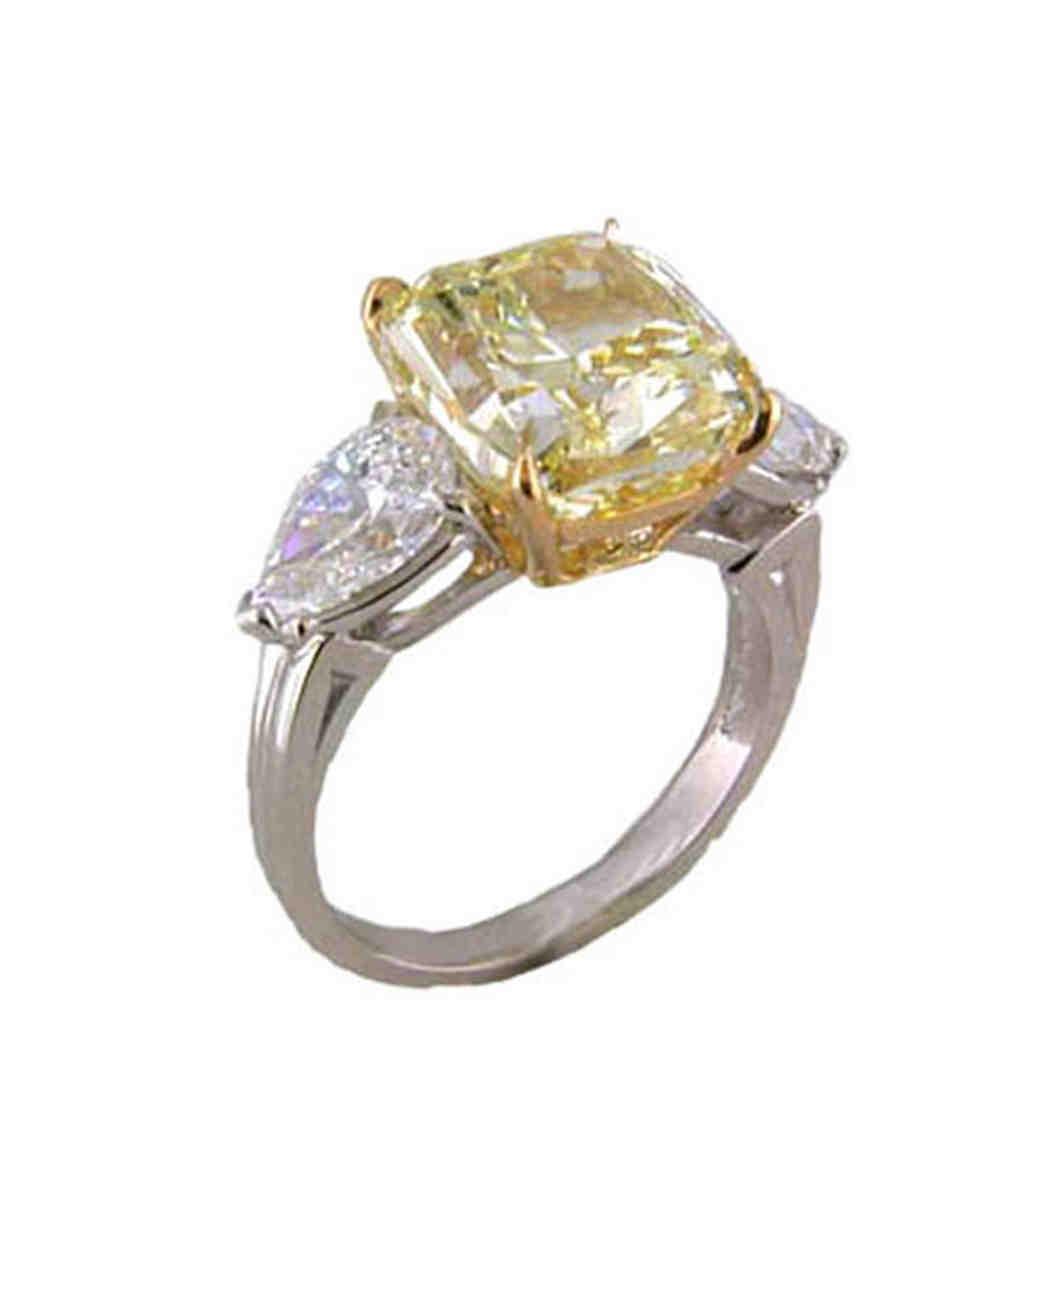 heyman_ohb_301396_gold_plat_fcy_dia_ring.jpg